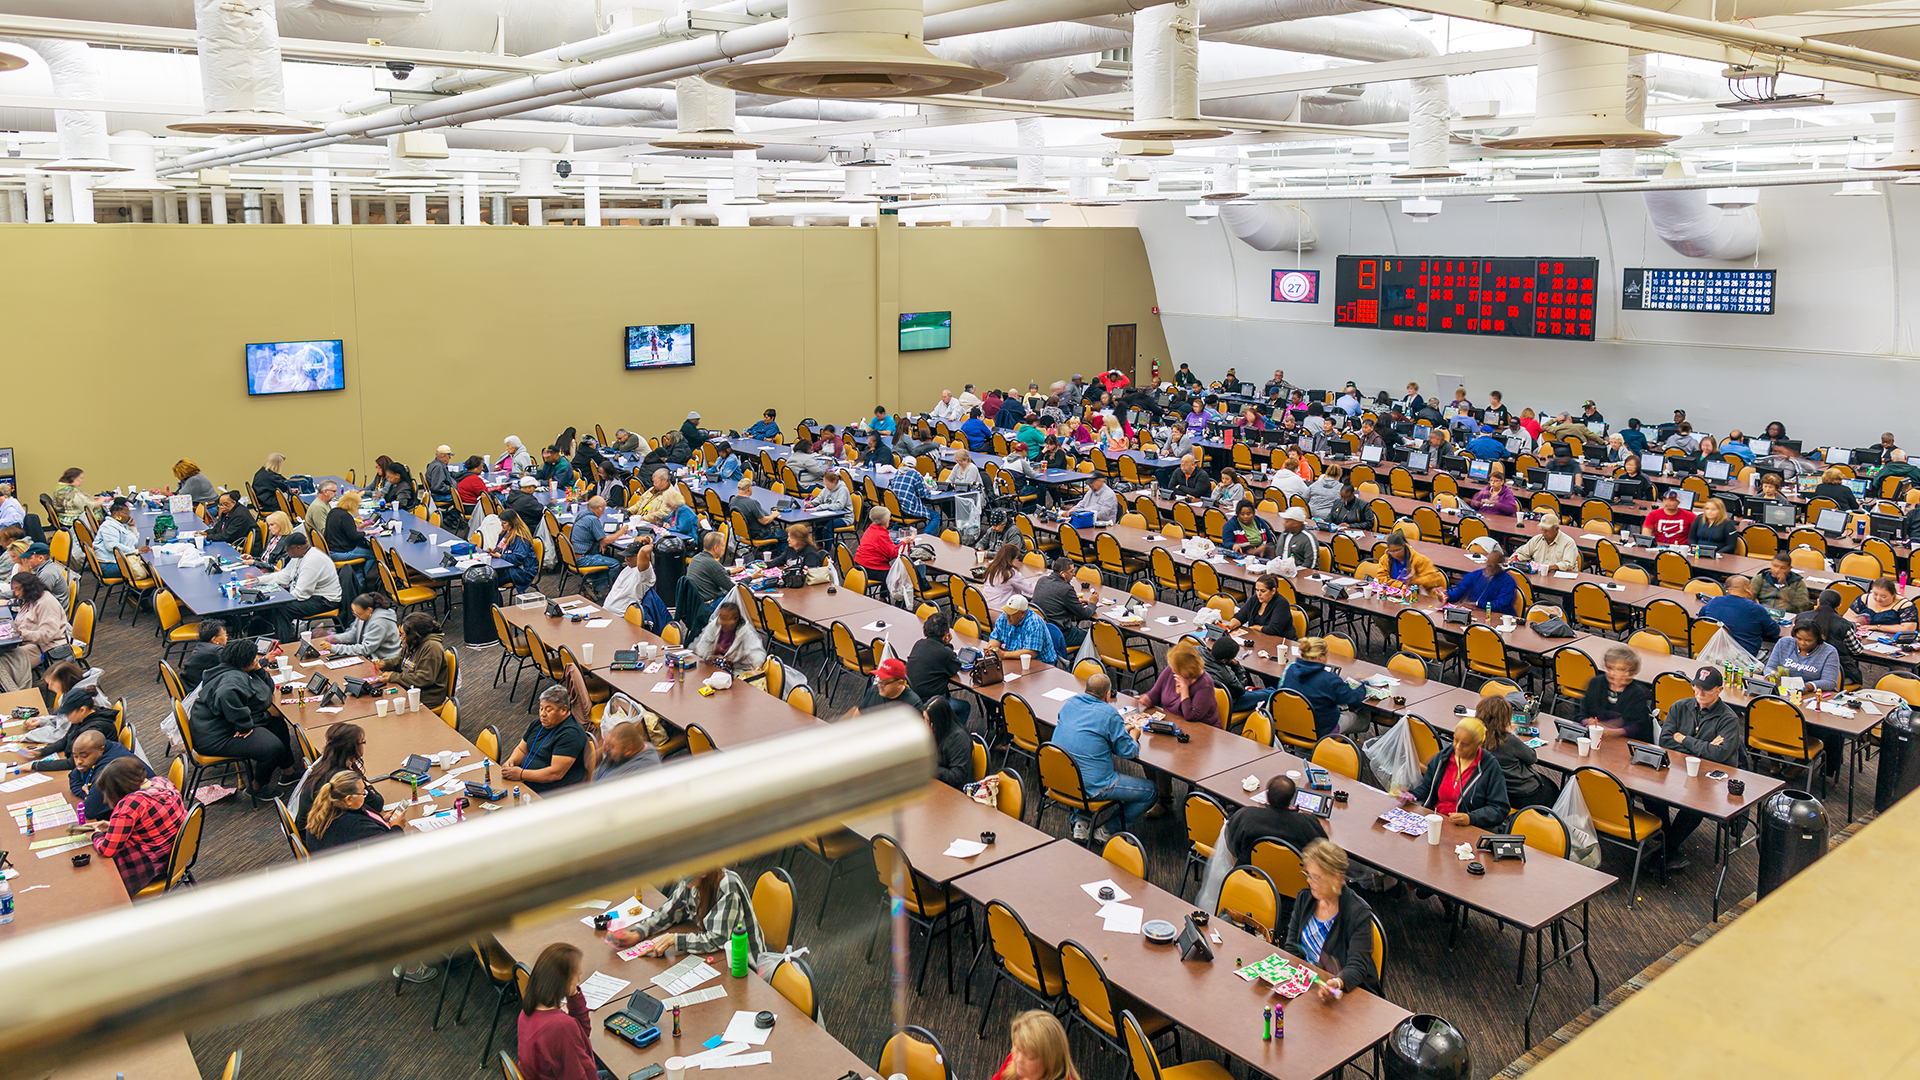 Bingo at winstar casino casino cruise west coast florida